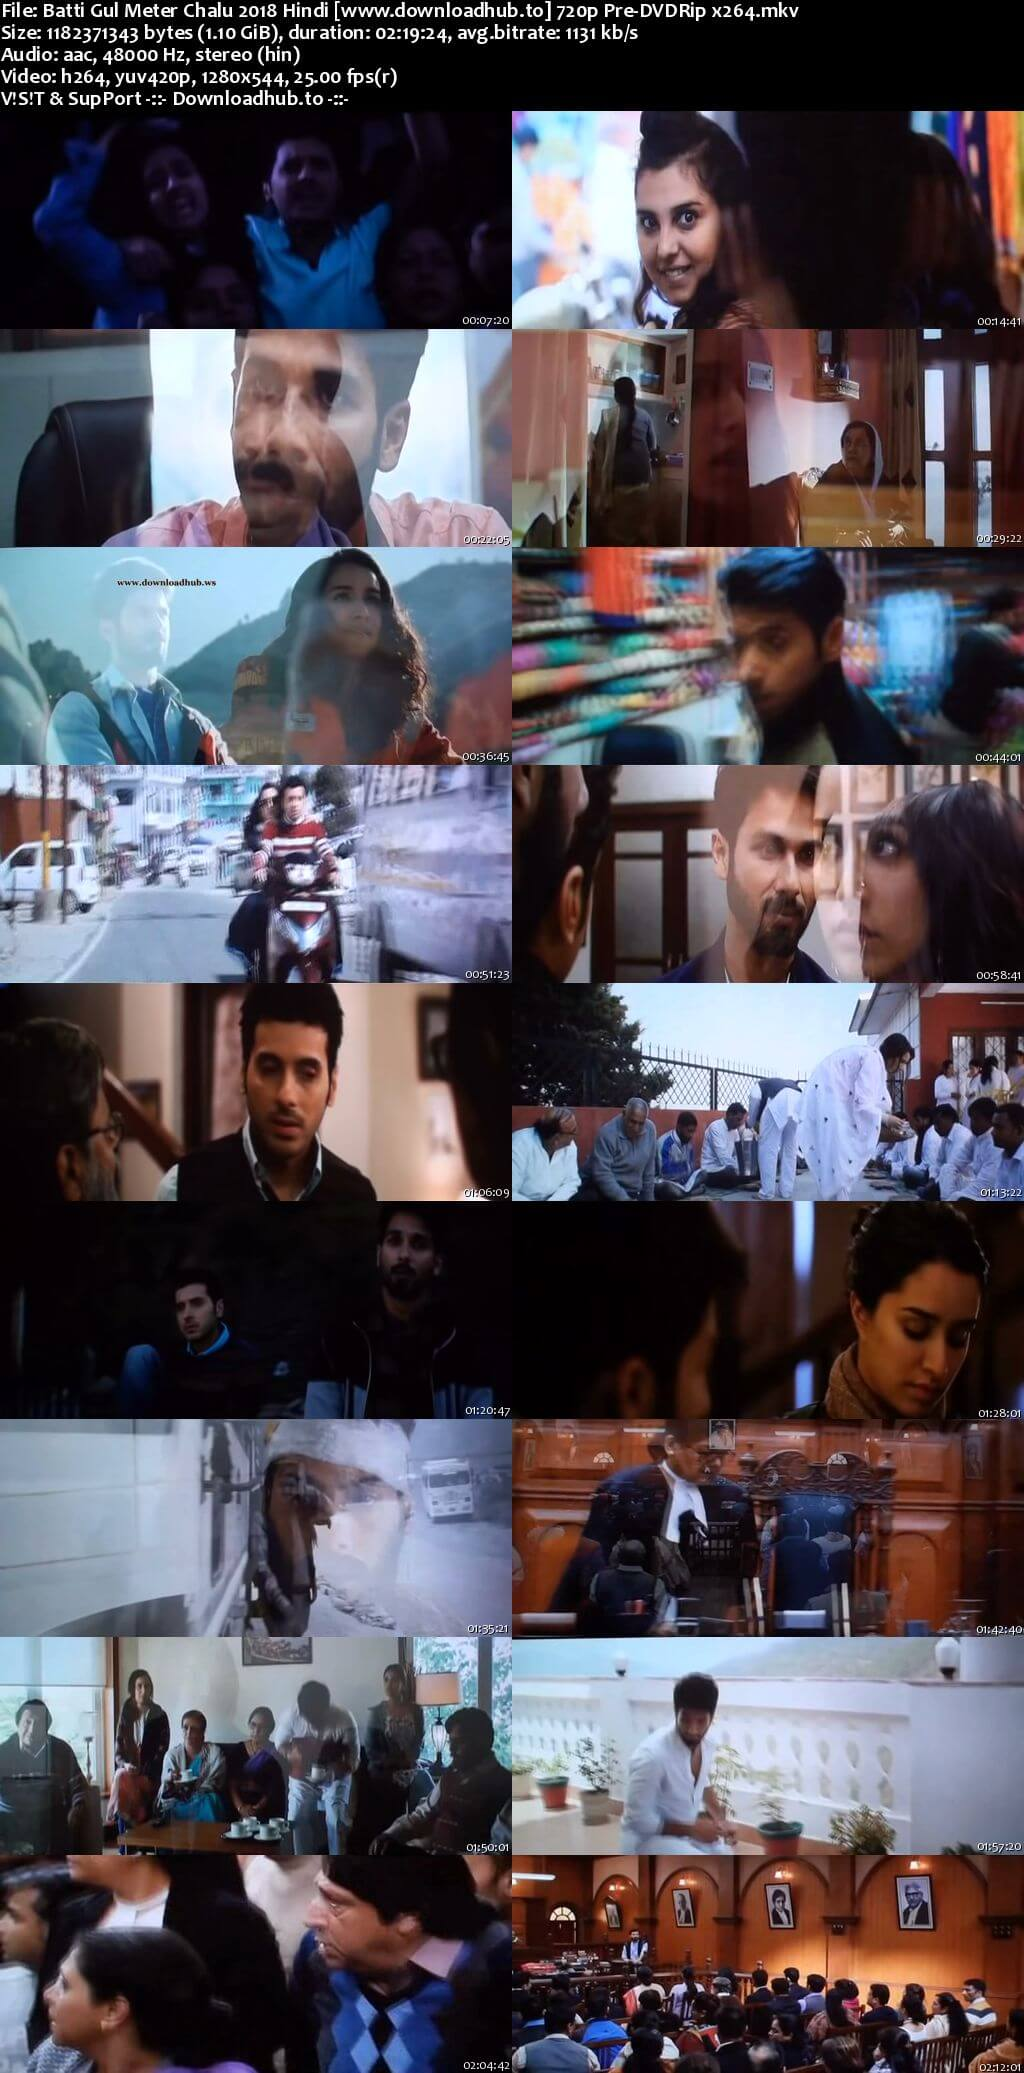 Batti Gul Meter Chalu 2018 Hindi 720p Pre-DVDRip x264